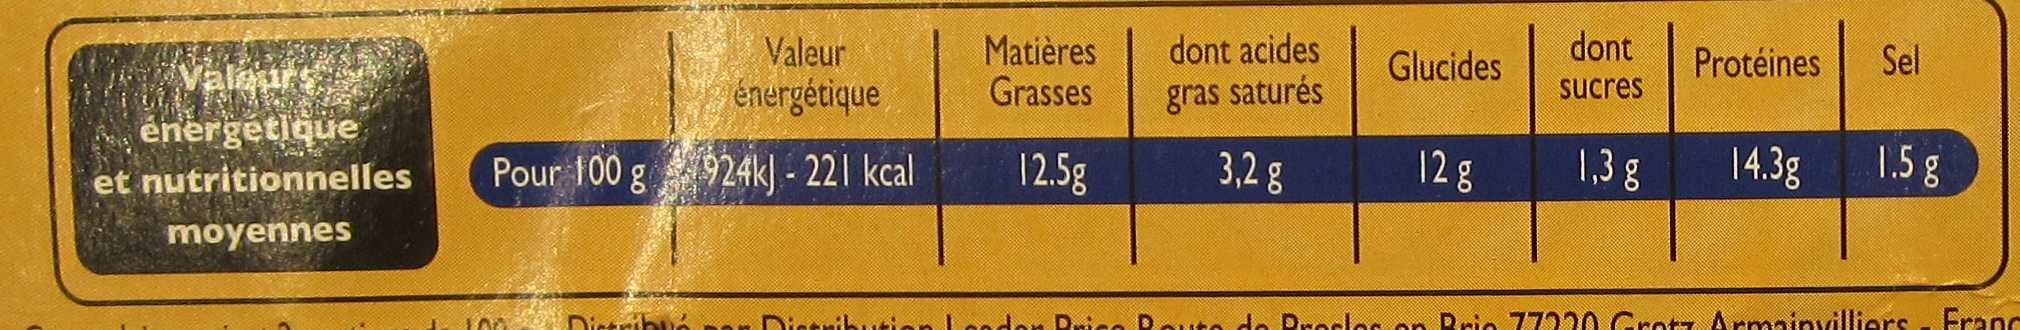 Cordon Bleu de Dinde - Nutrition facts - fr